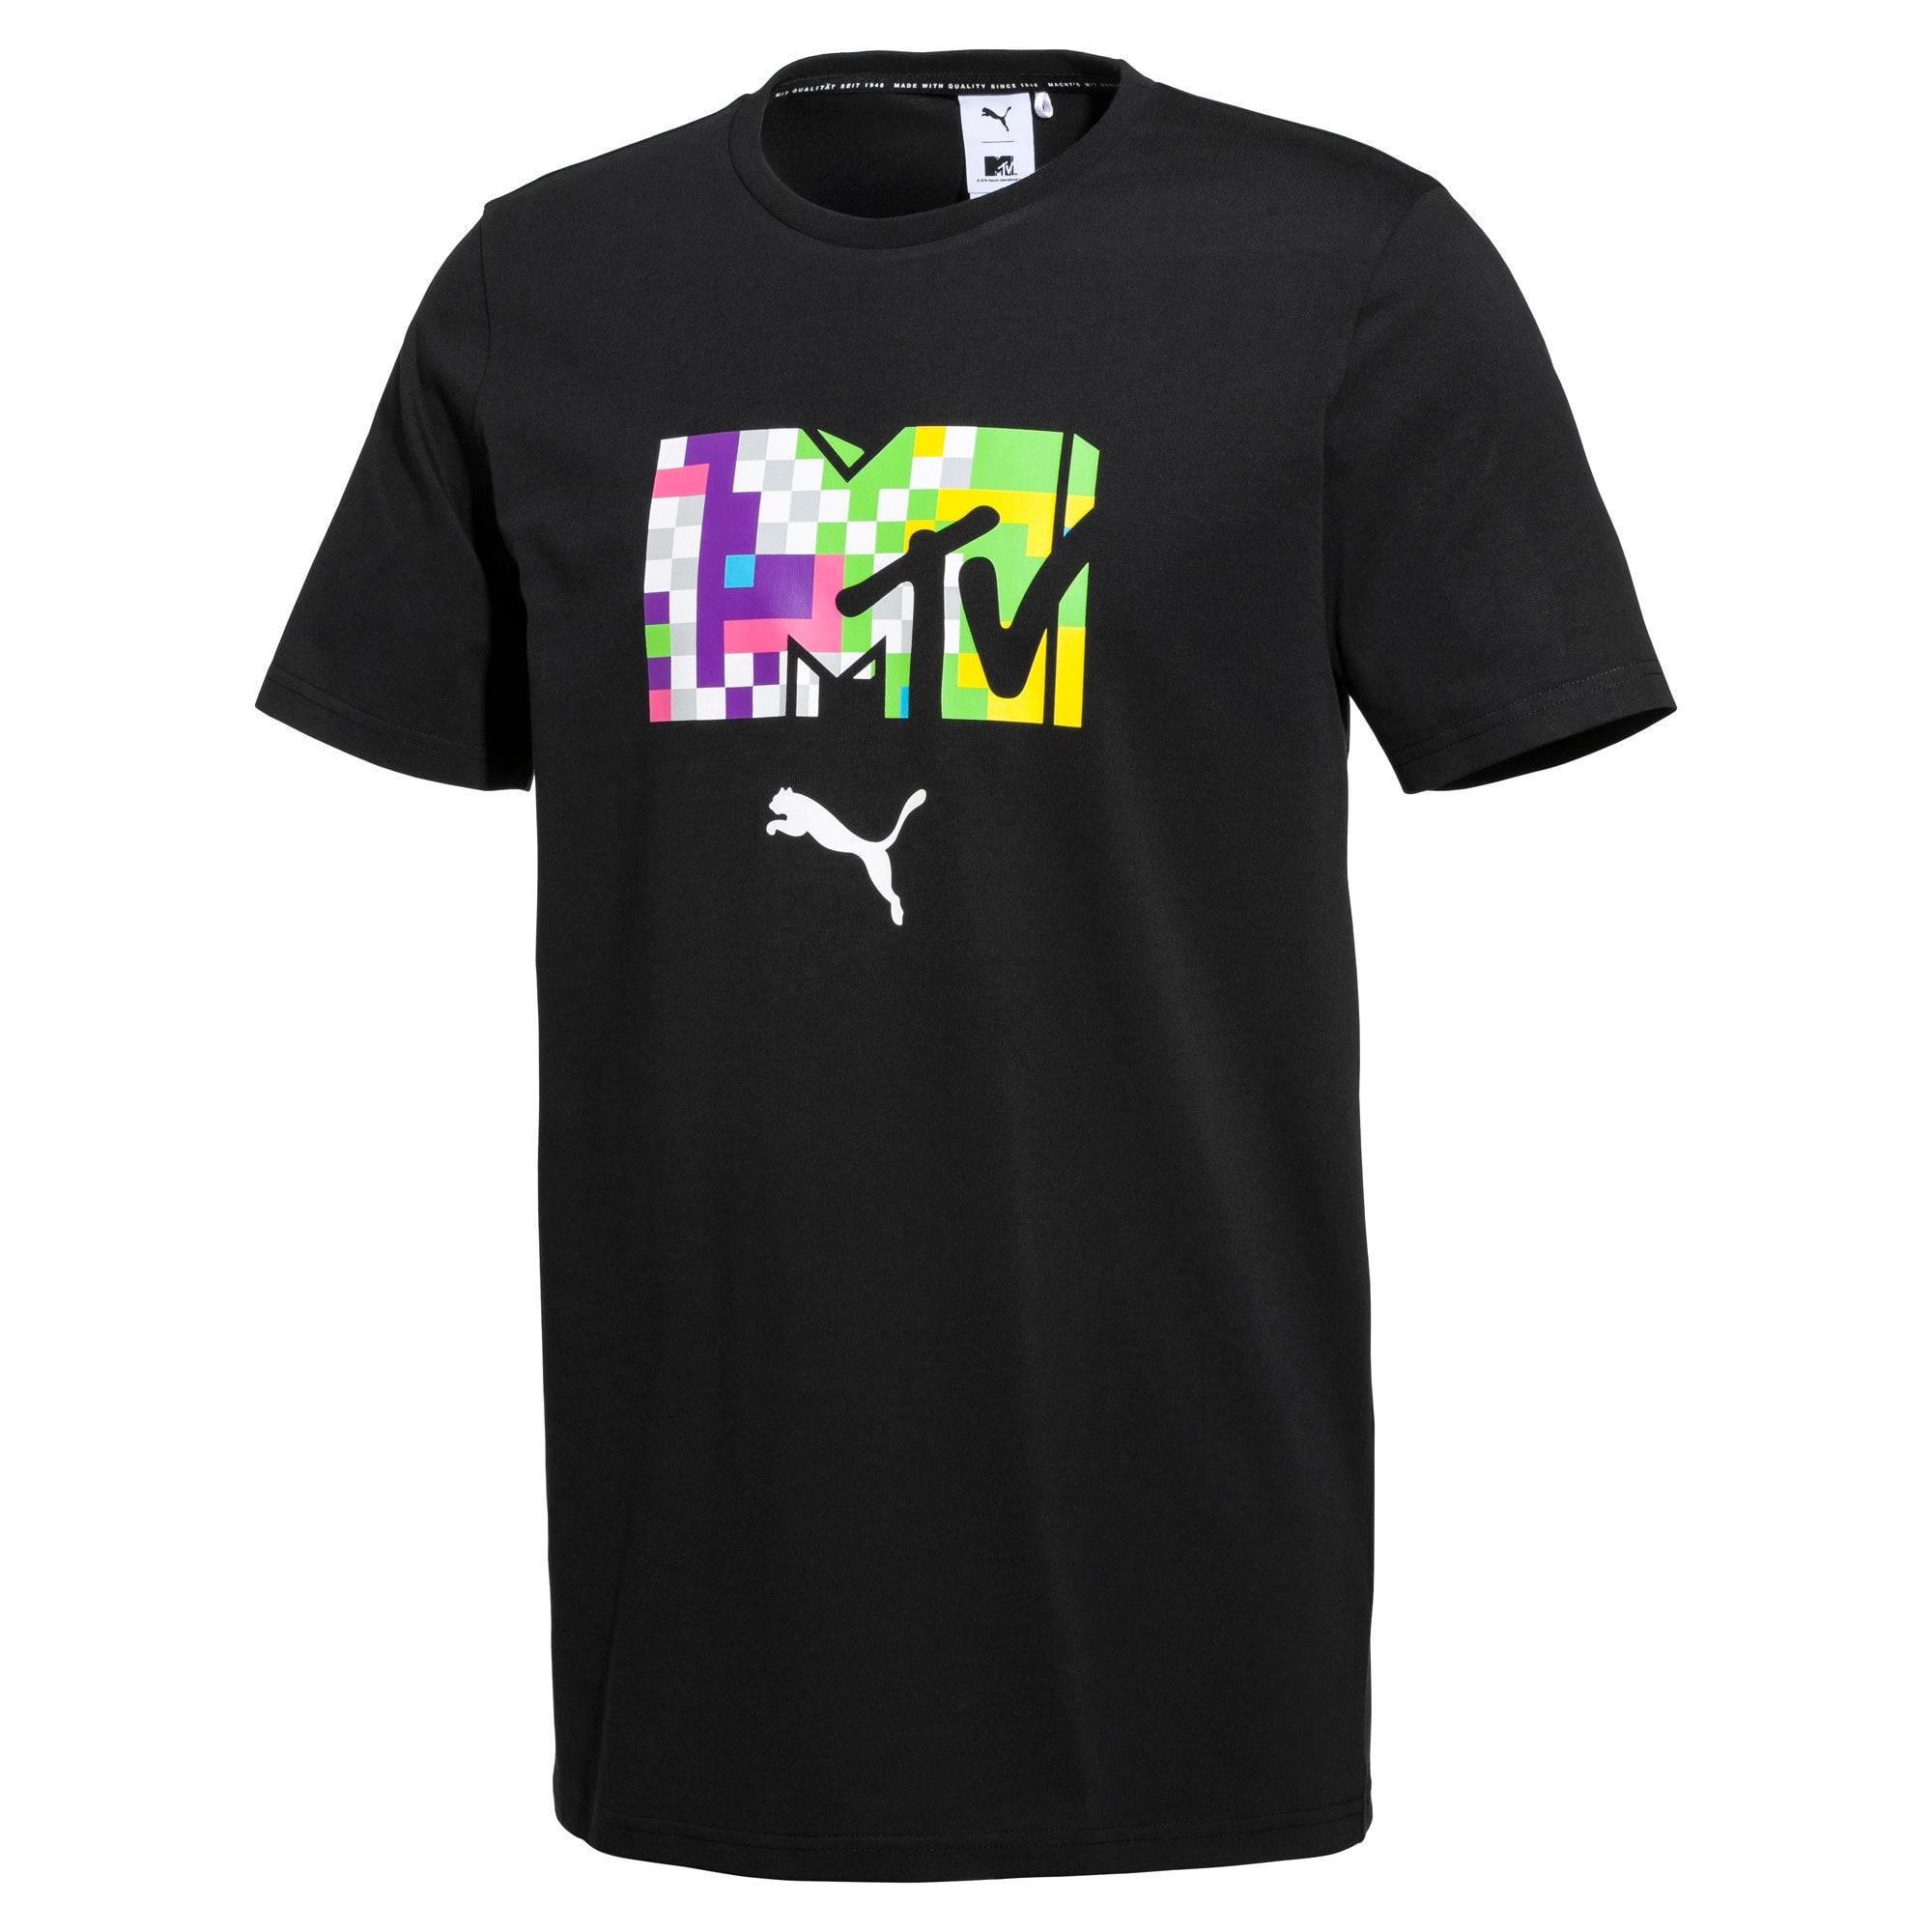 Thumbnail 1 of PUMA x MTV Men's Tee, Puma Black, medium